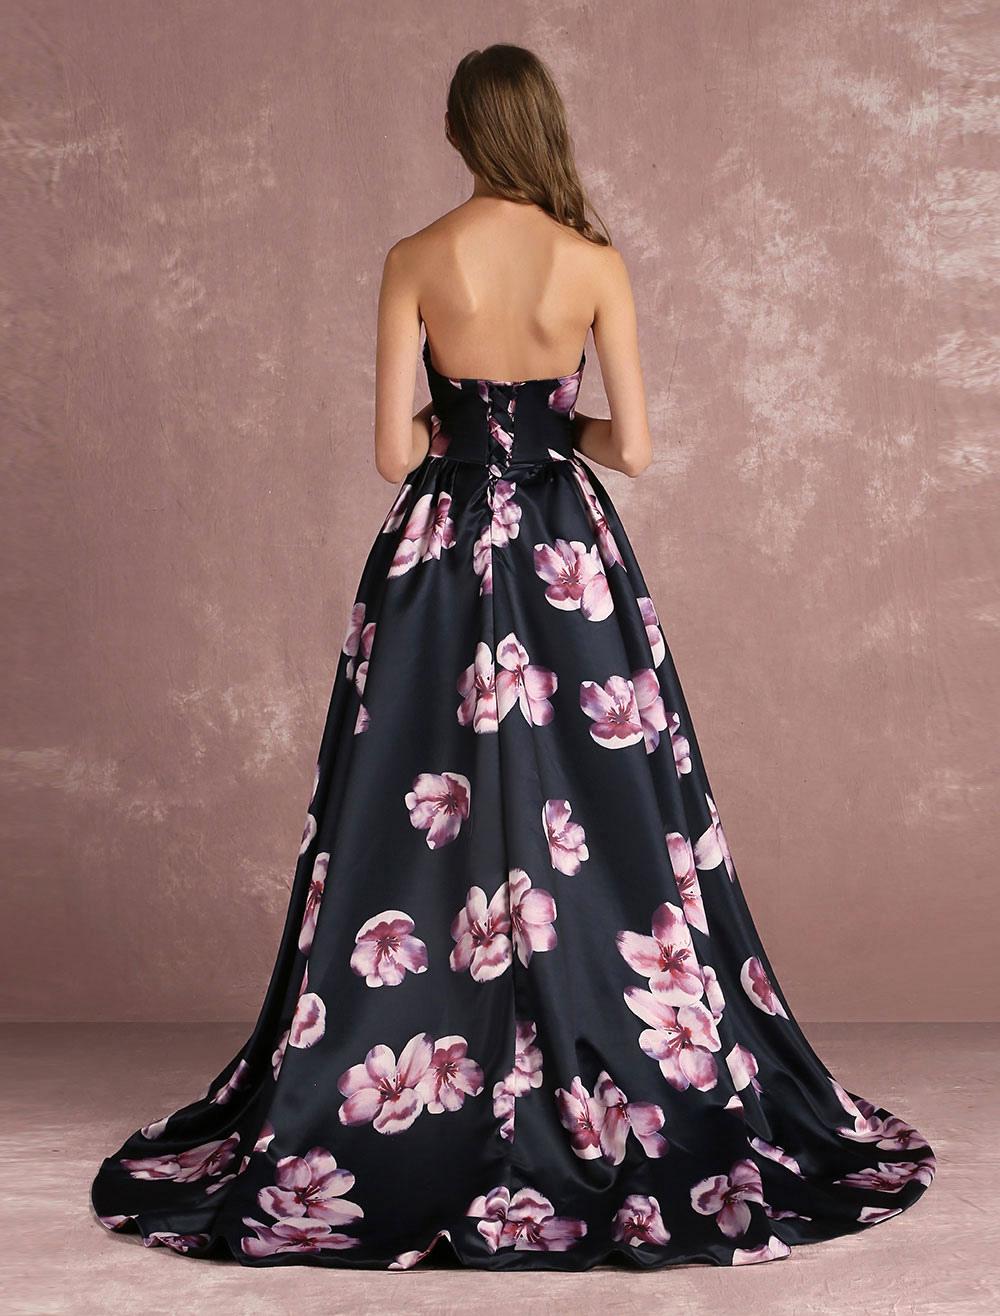 floral festzug kleid schwarz sweetheart trägerloser ausschnitt lange  ballkleid entbeint gedruckten kapelle zug anlass kleid